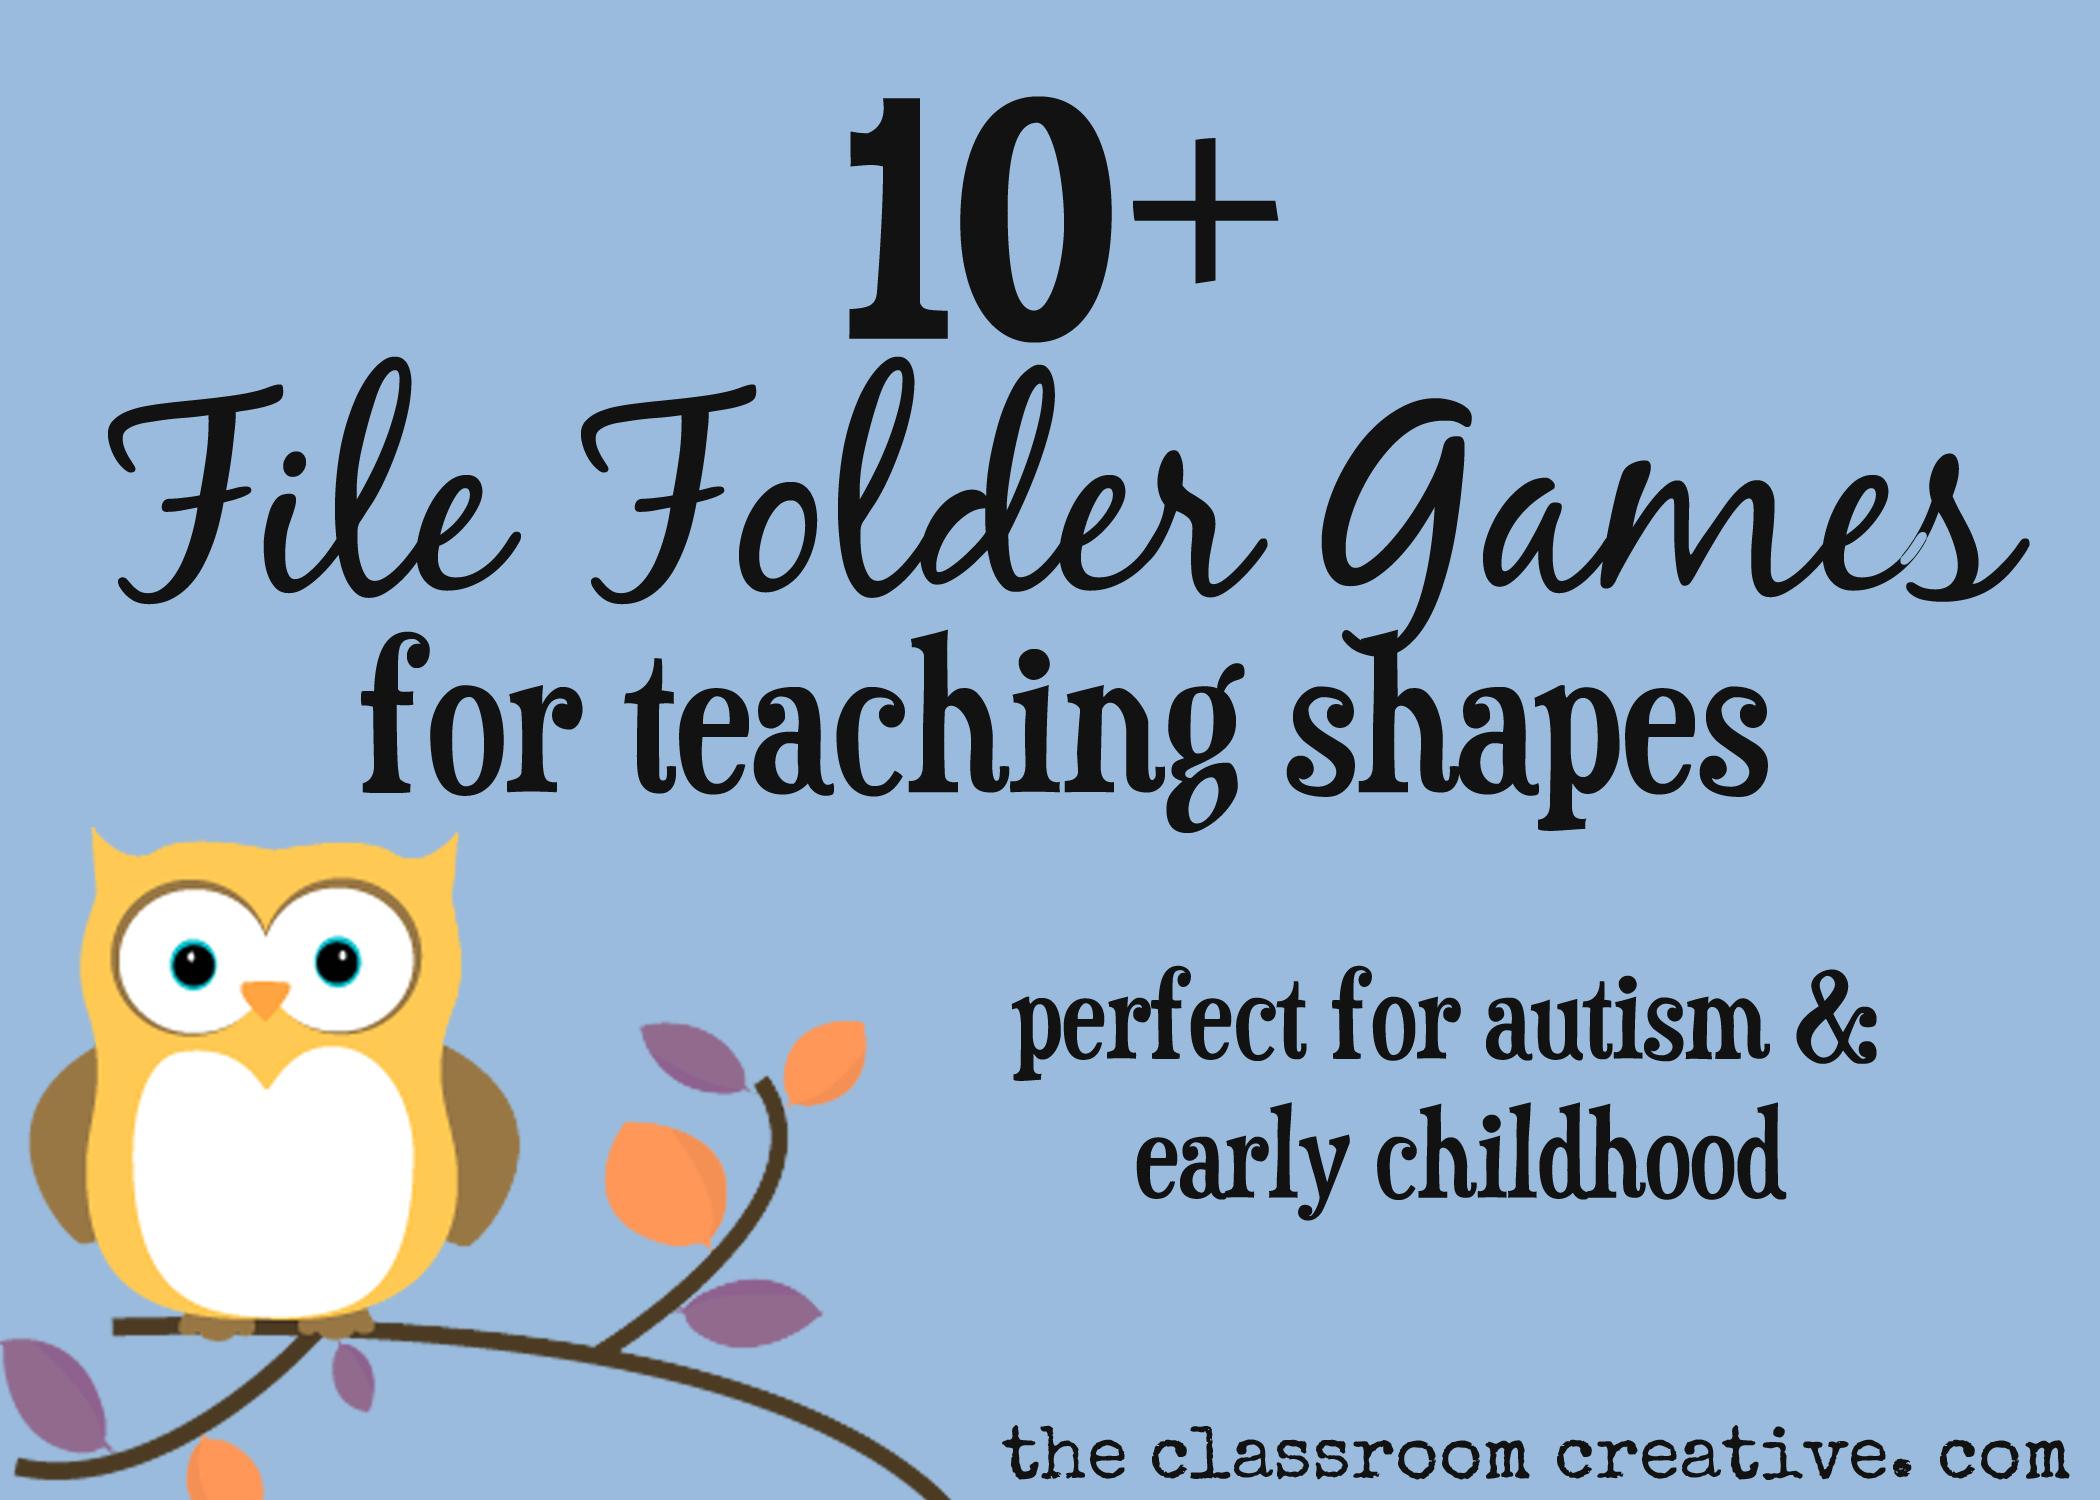 File Folder Games For Teaching Shapes - Free Printable Folder Games